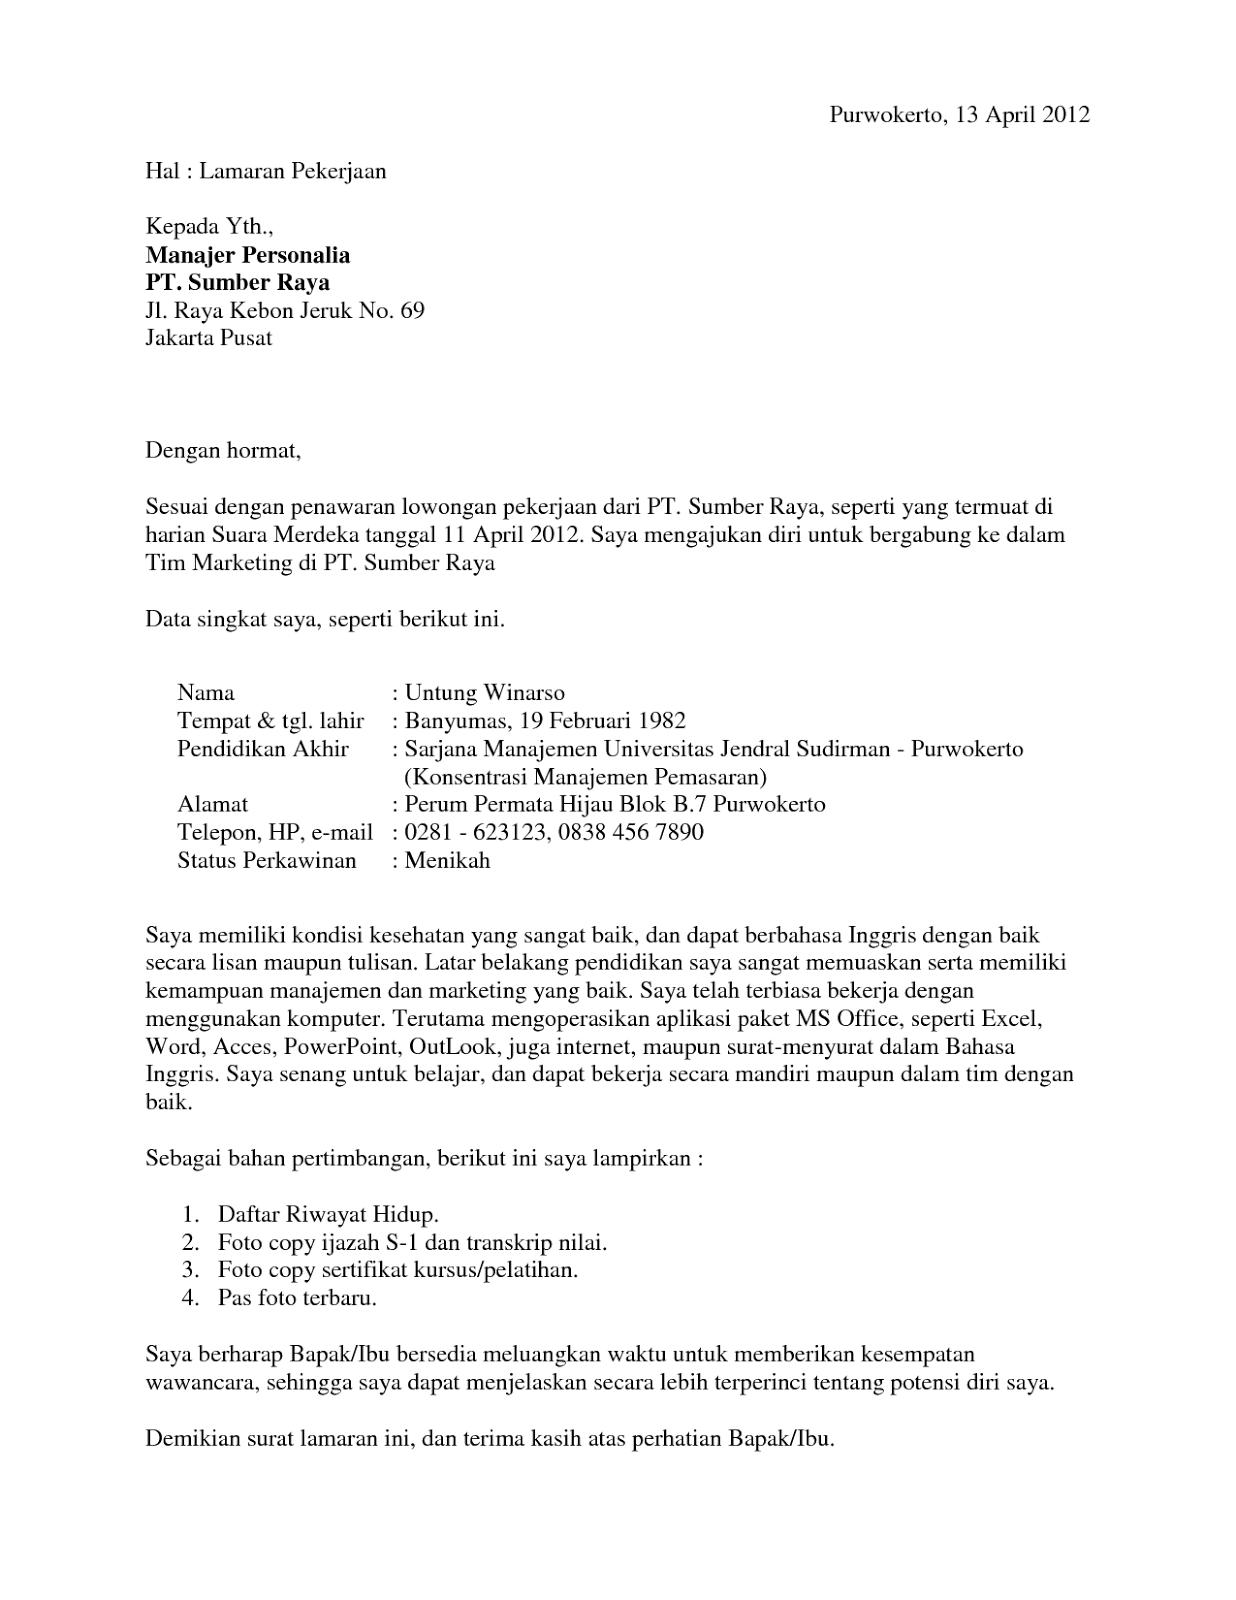 8 Contoh Surat Lamaran Kerja Akuntansi Lengkap Guild Jobs